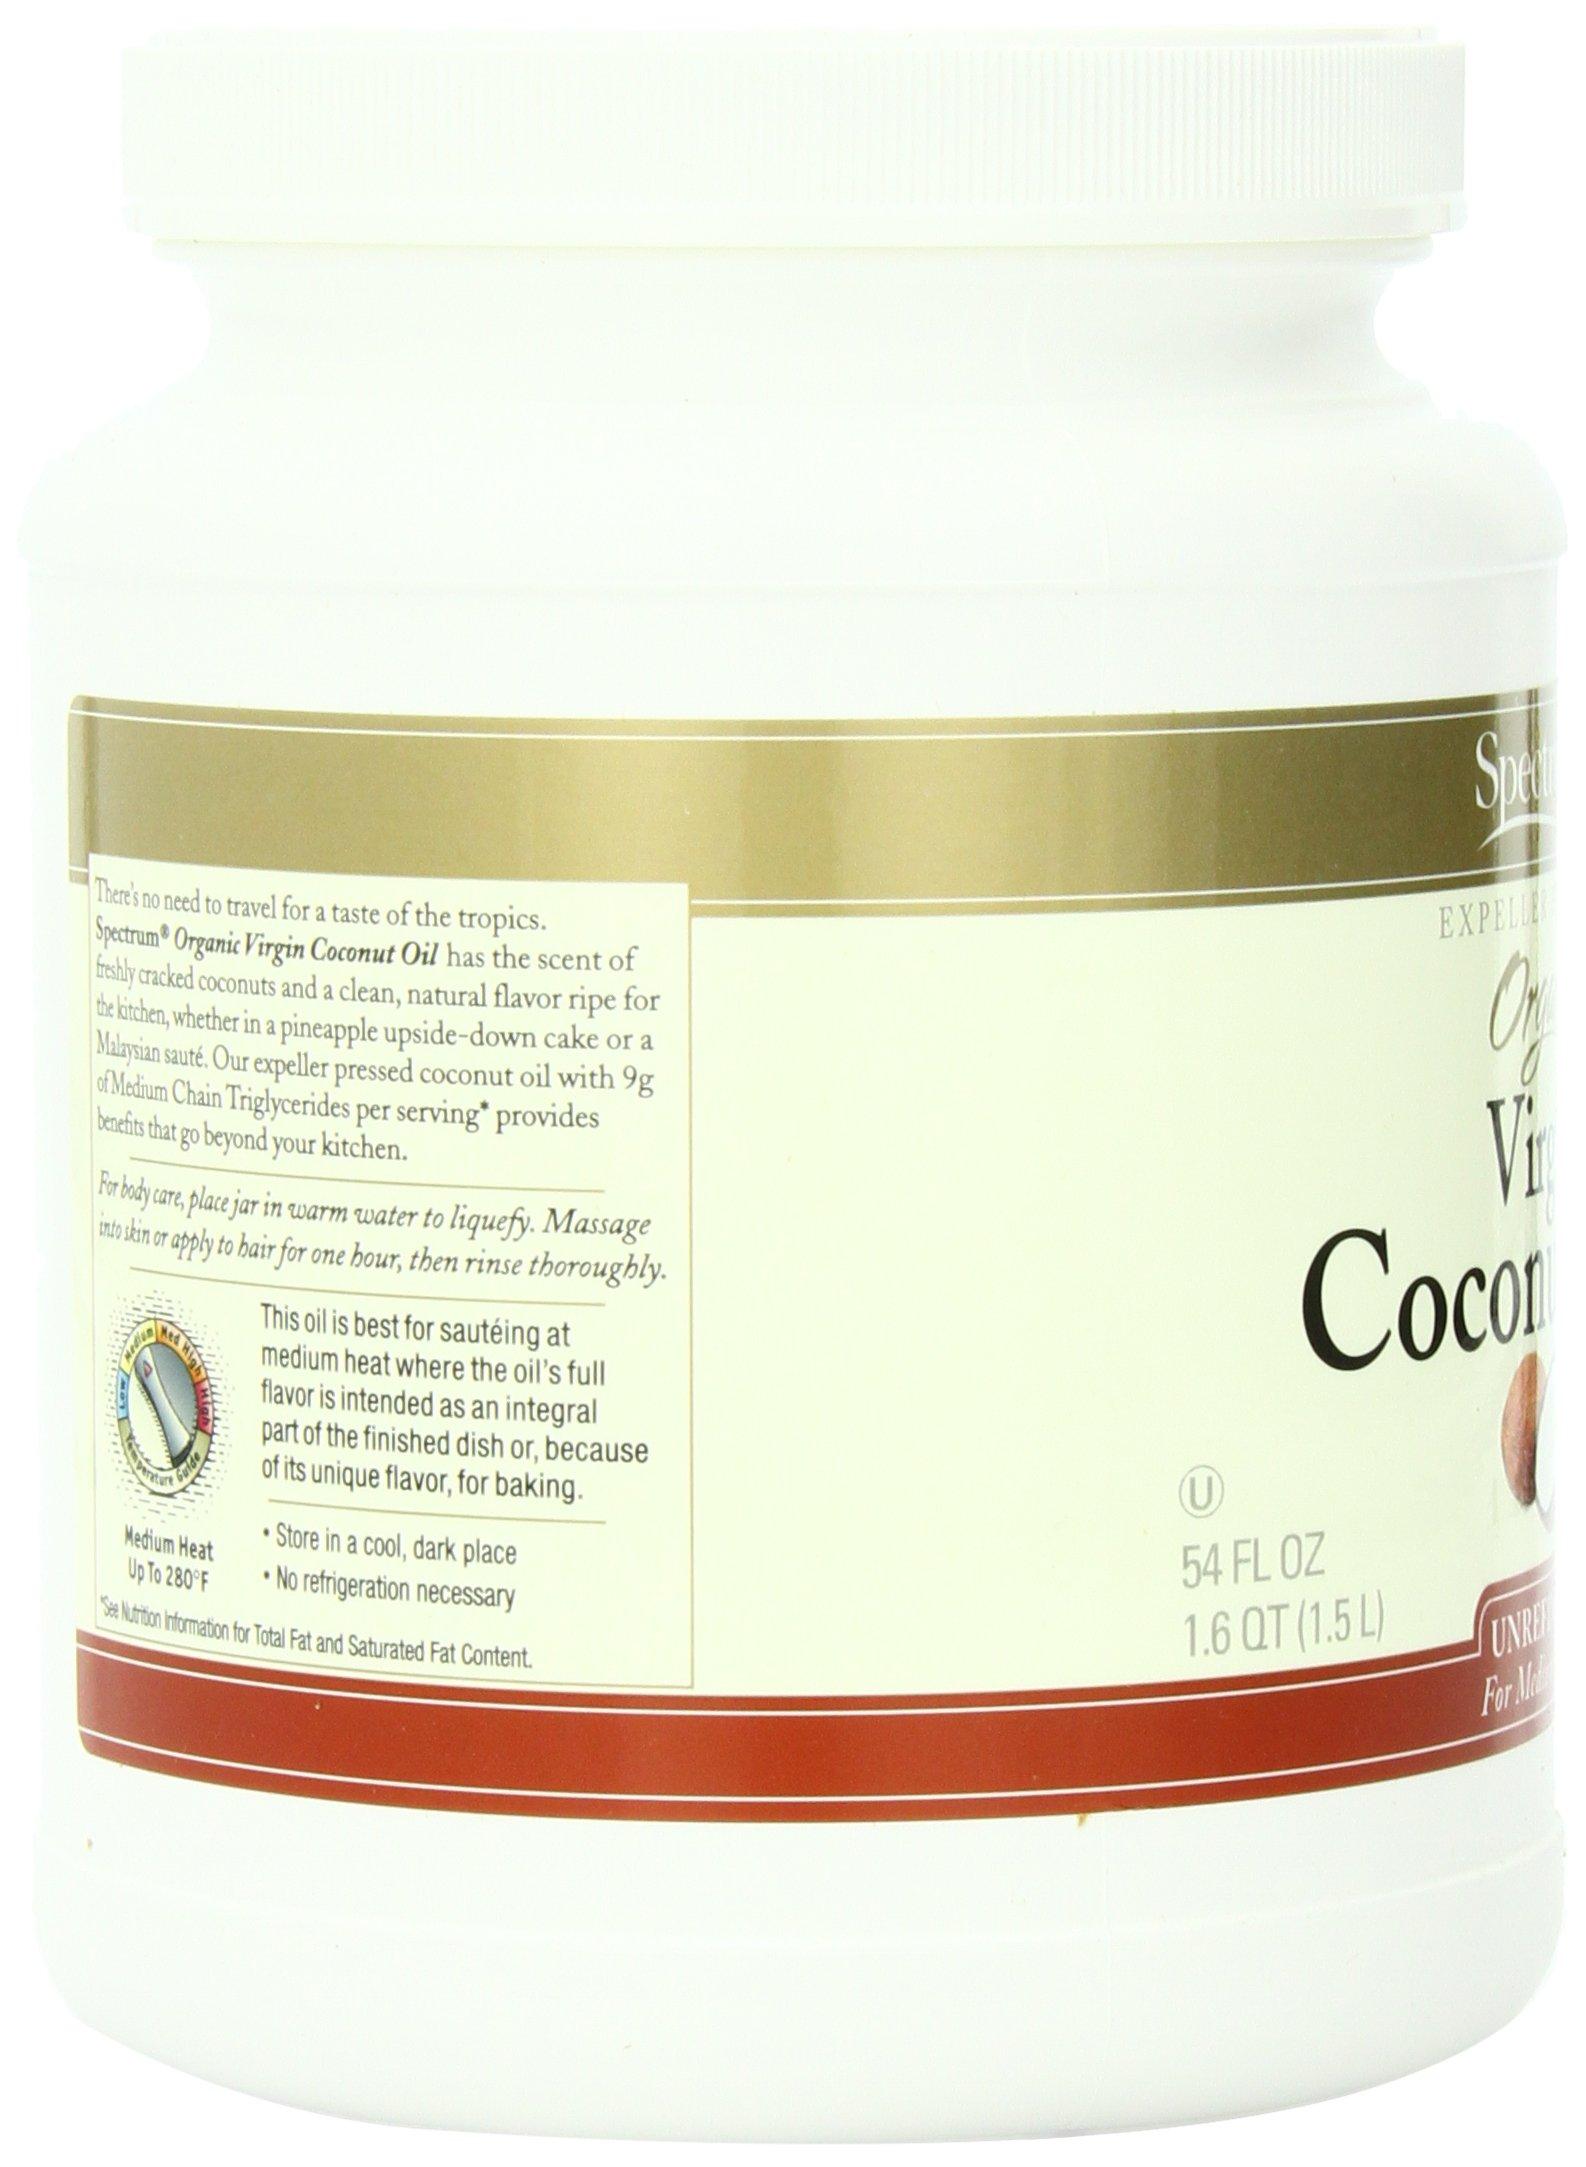 Spectrum Organic Coconut Oil for Cooking, Virgin, Unrefined, 54 fl. oz. by Spectrum (Image #4)